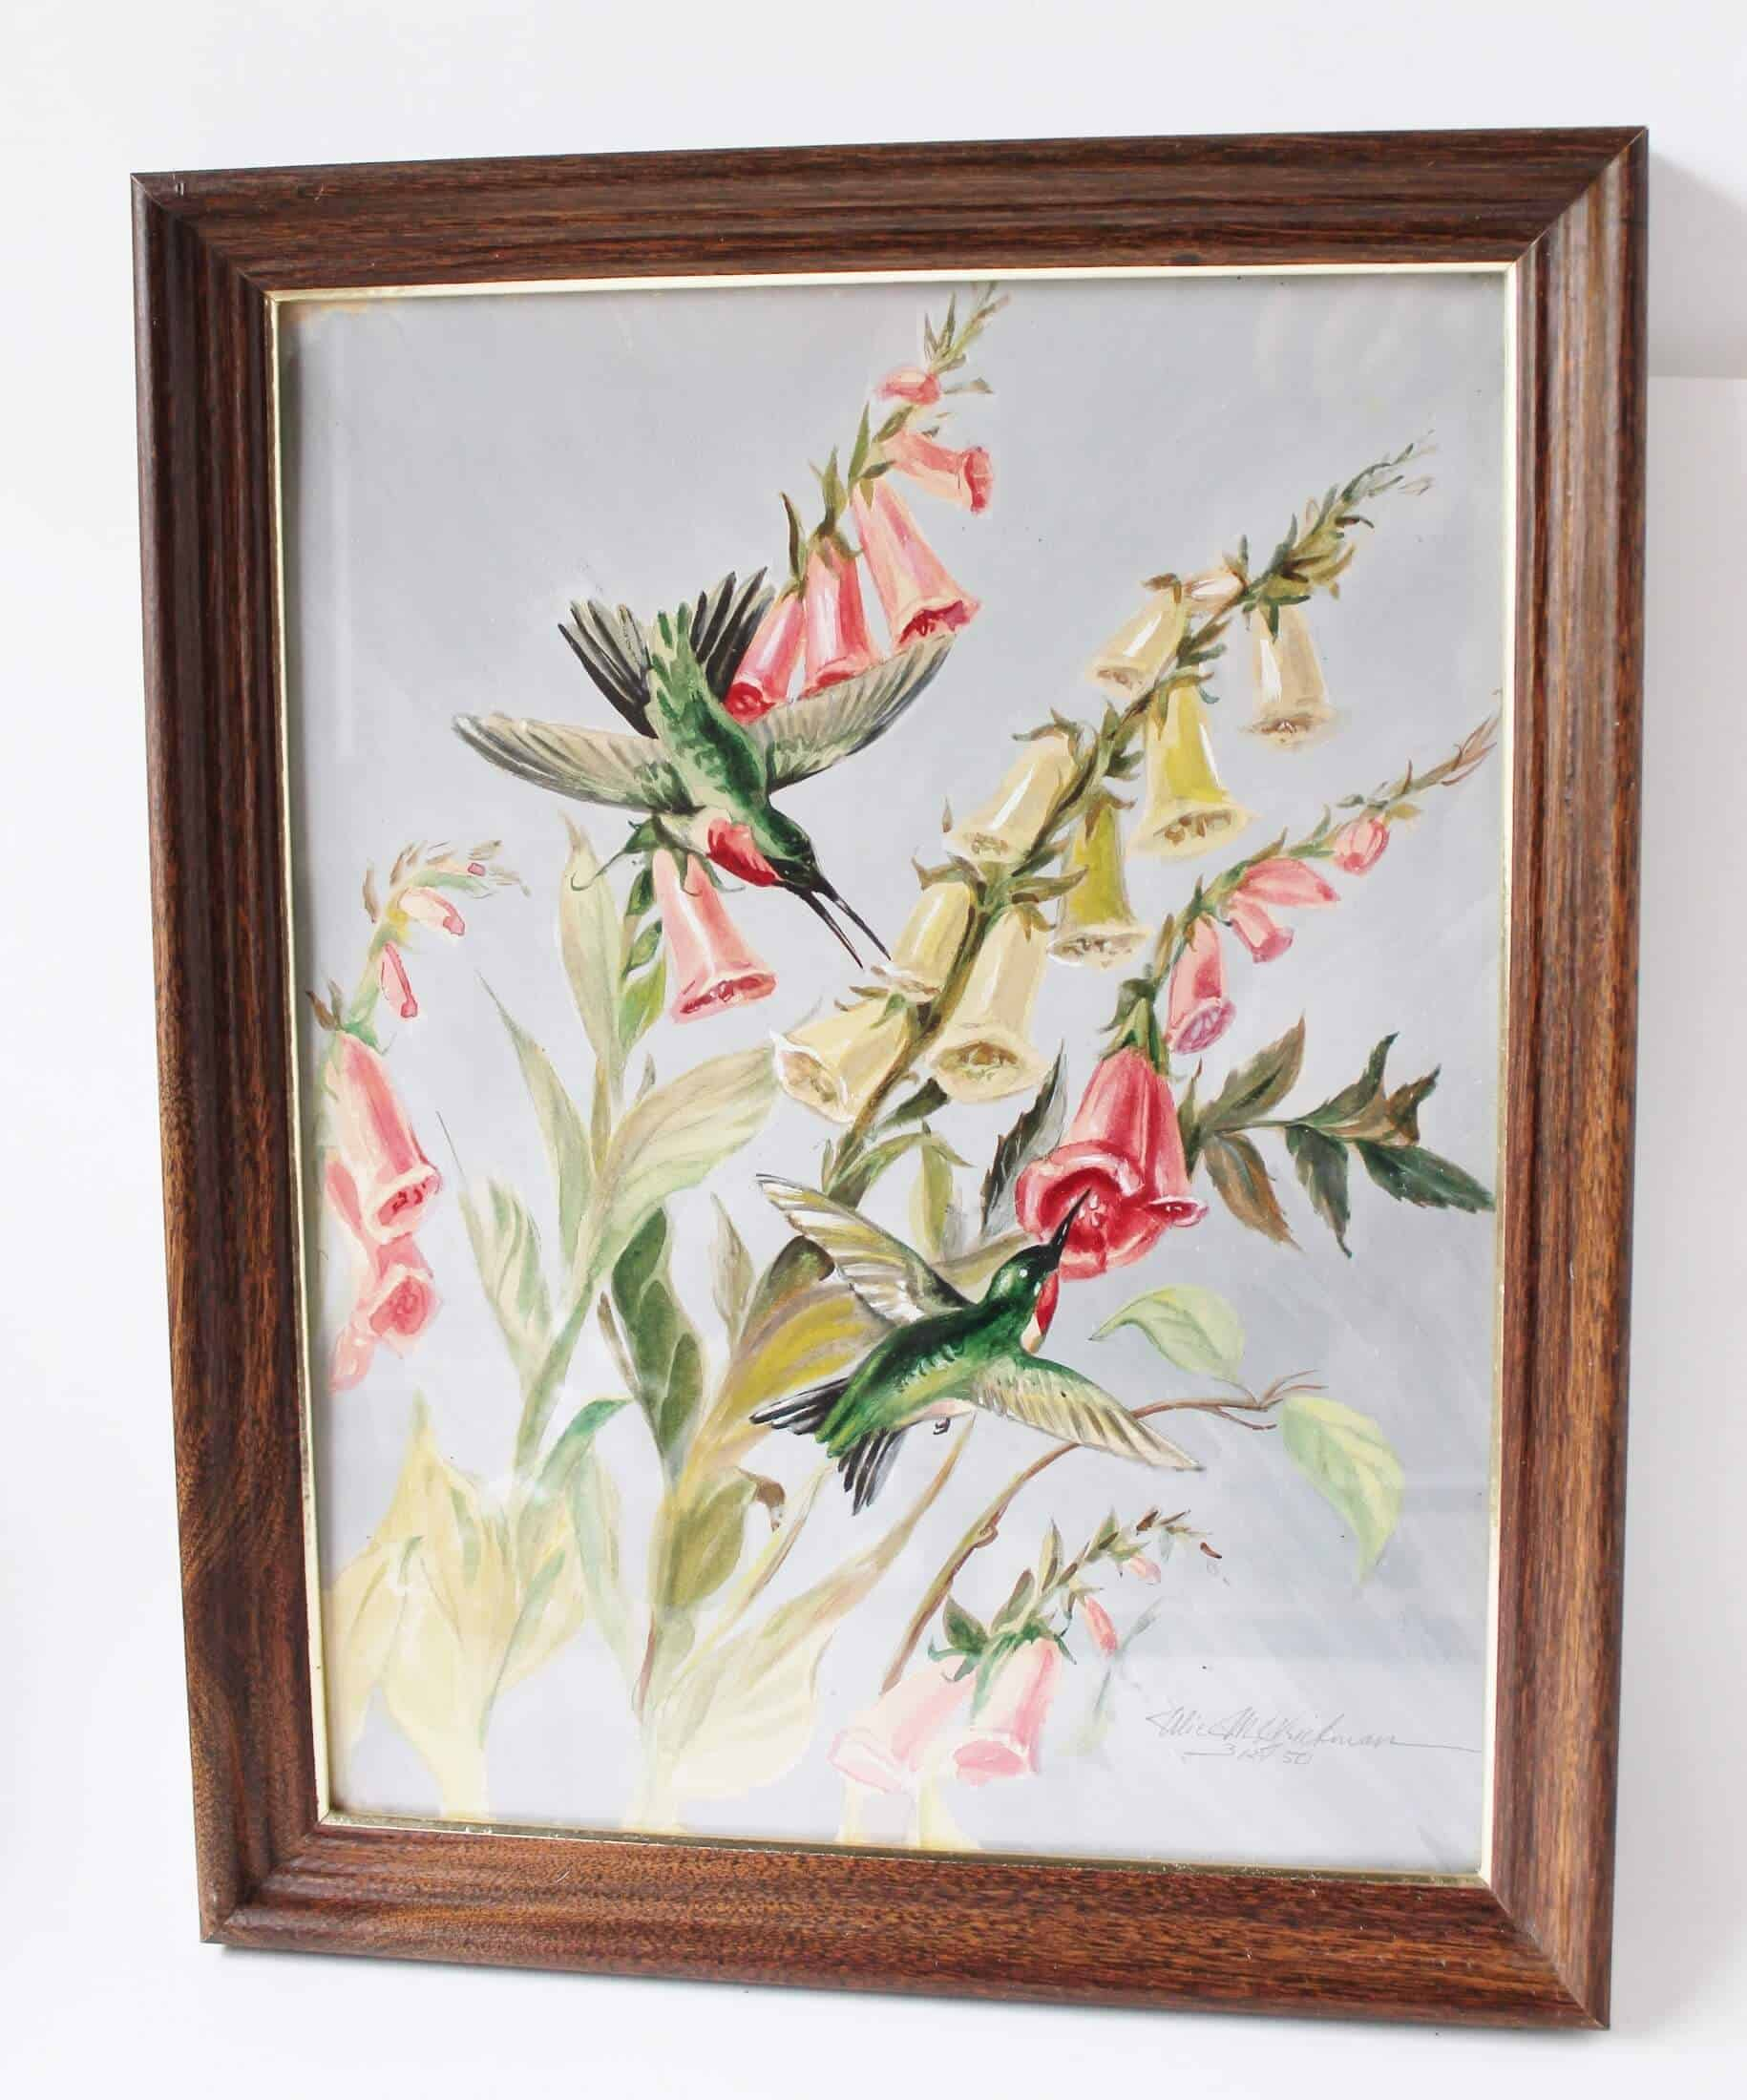 Original artwork of hummingbird and flowers